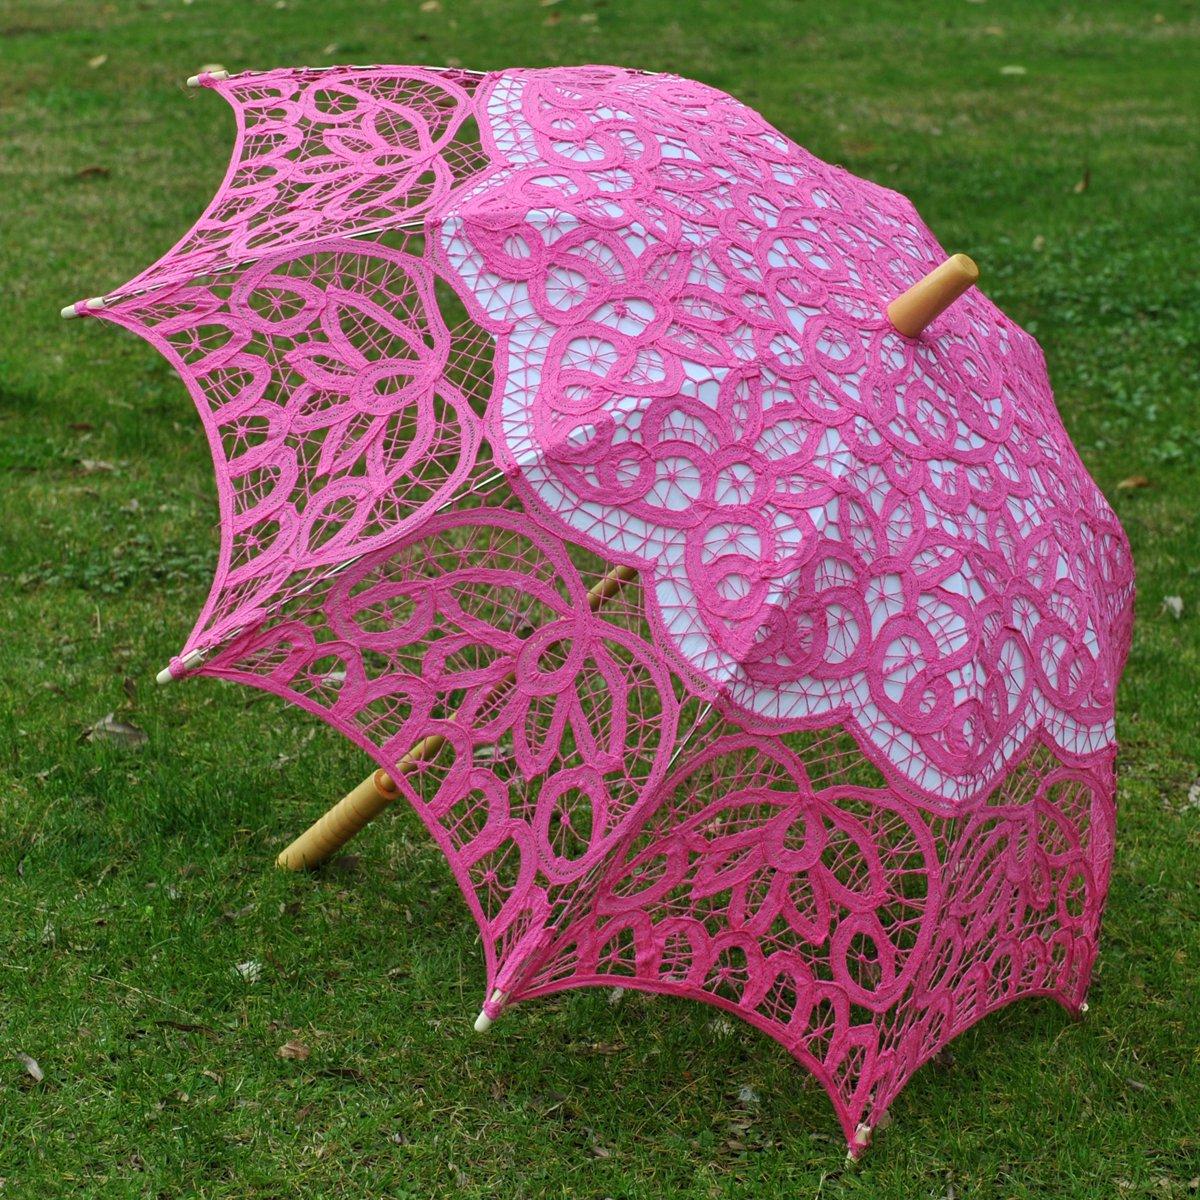 Topwedding Classic Cotton Lace Parasol Umbrella Bridal Shower Decoration, Fuschia by Topwedding (Image #6)